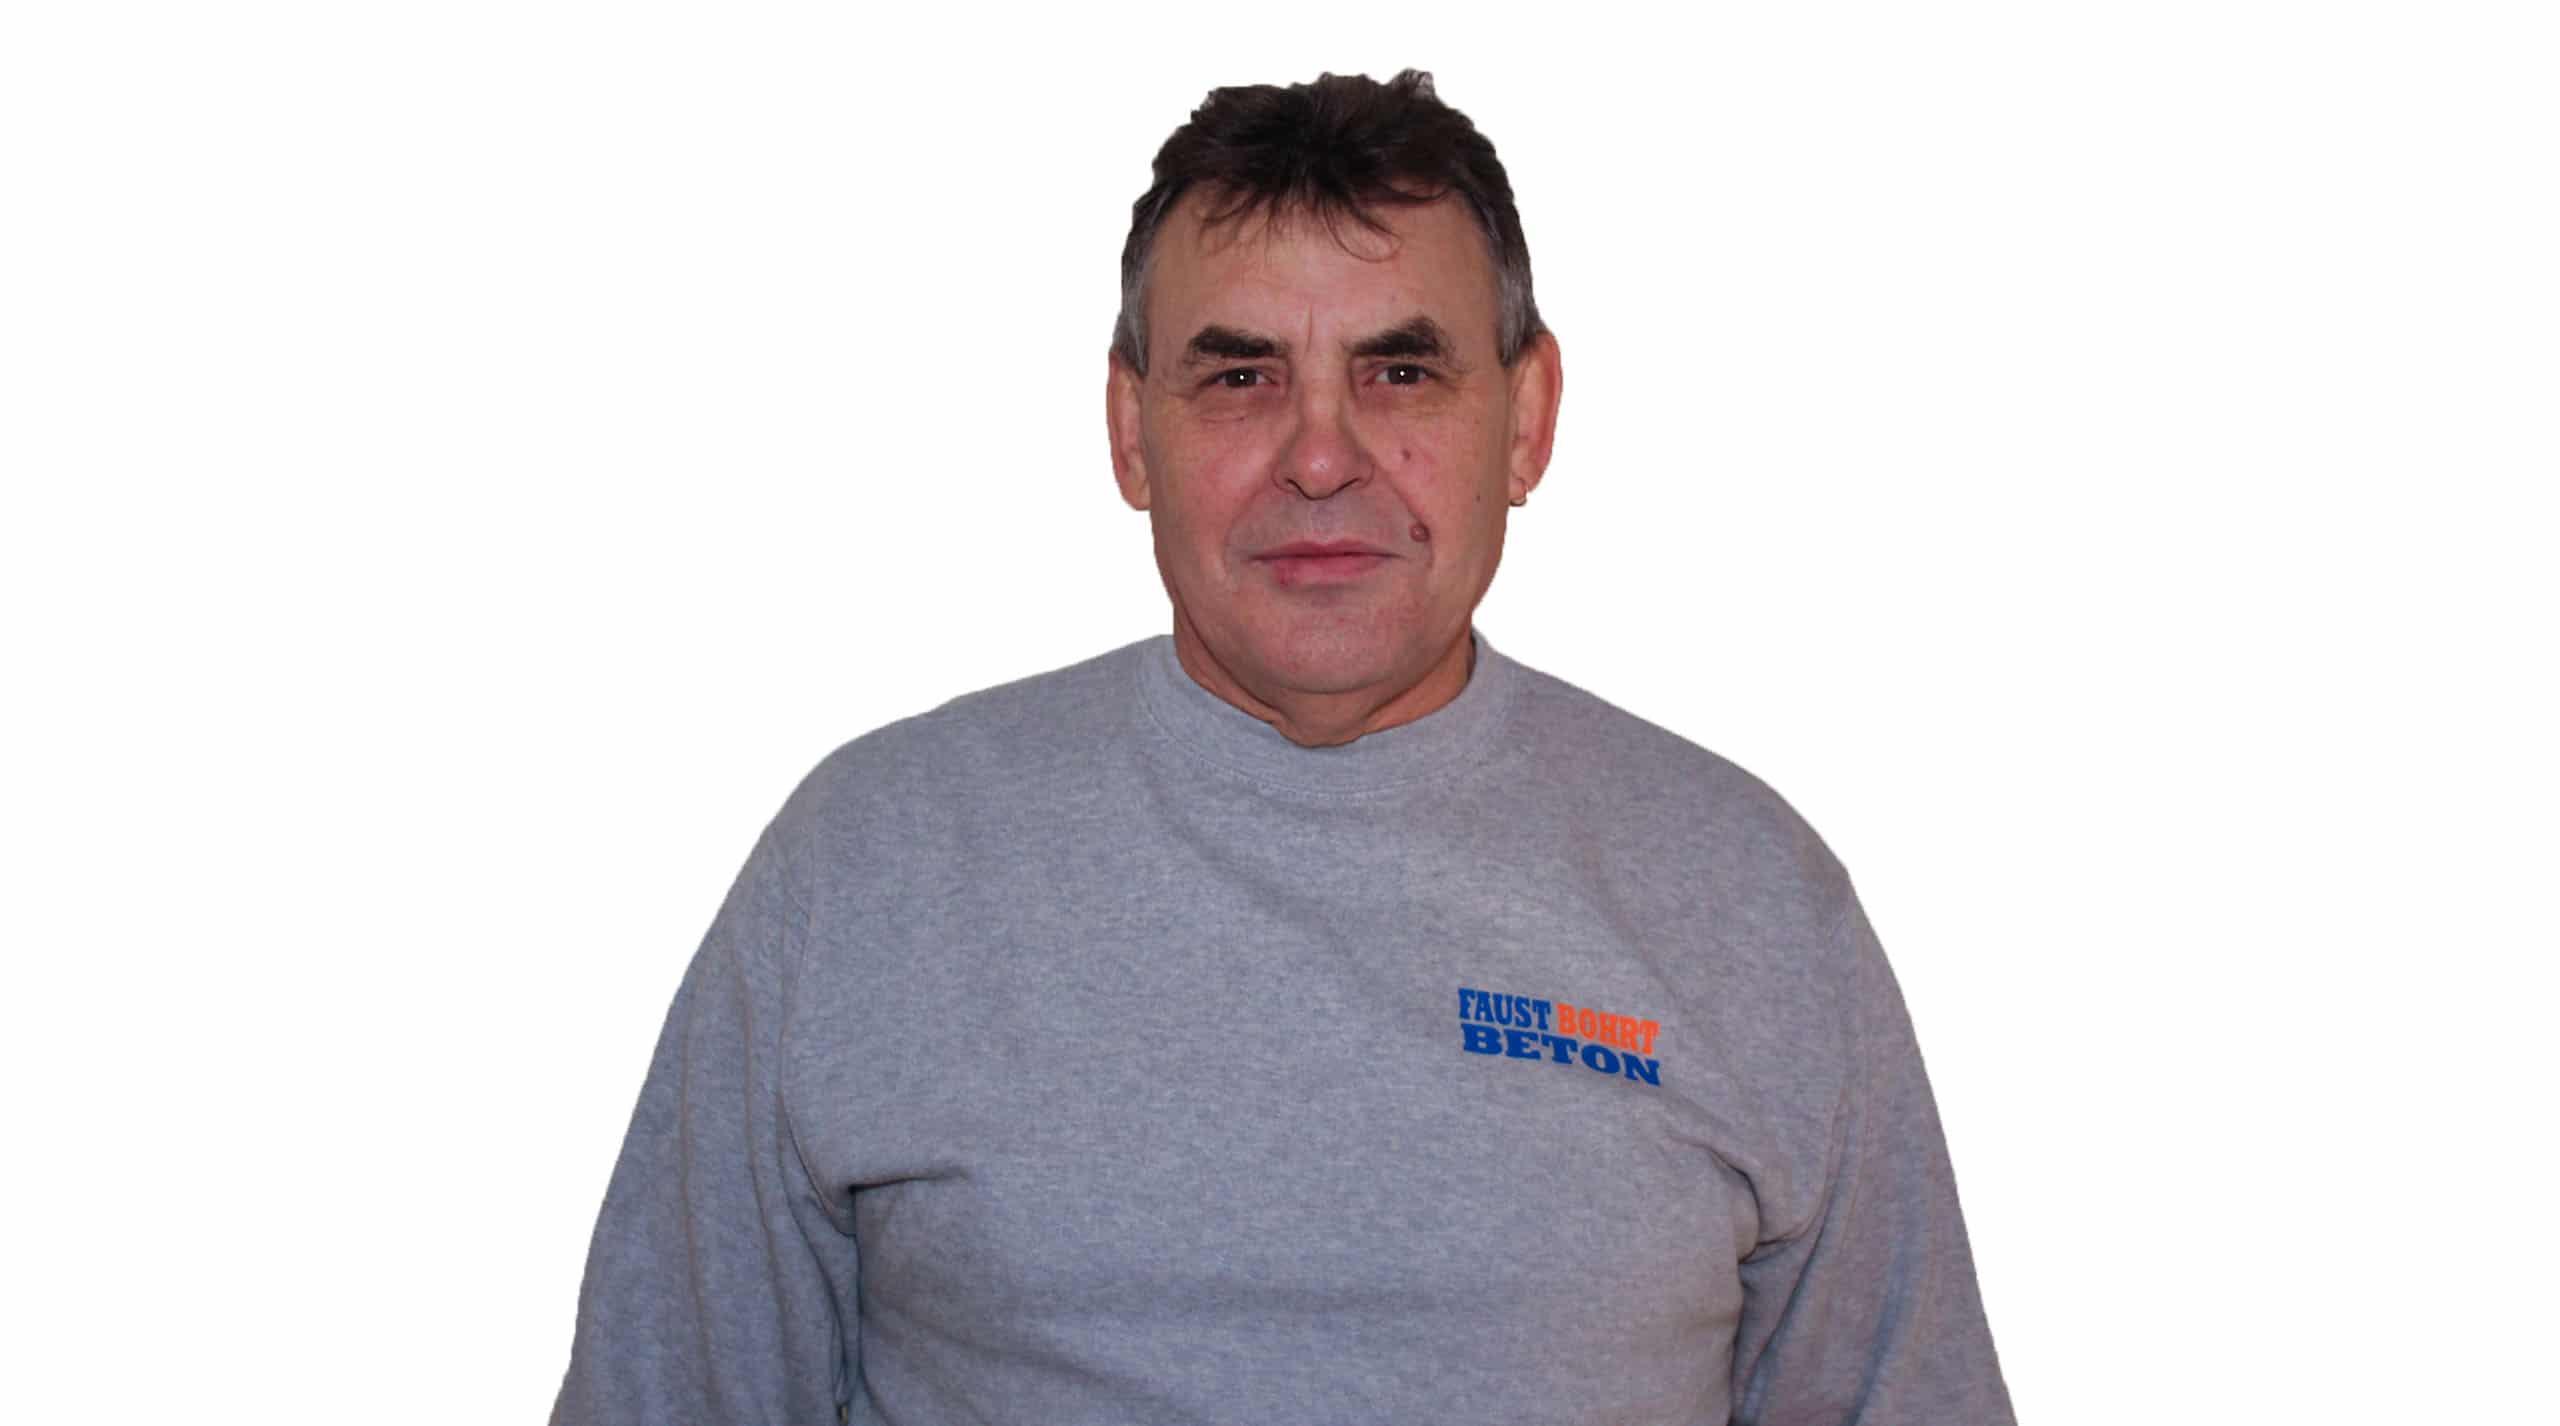 Viktor Lautenschläger